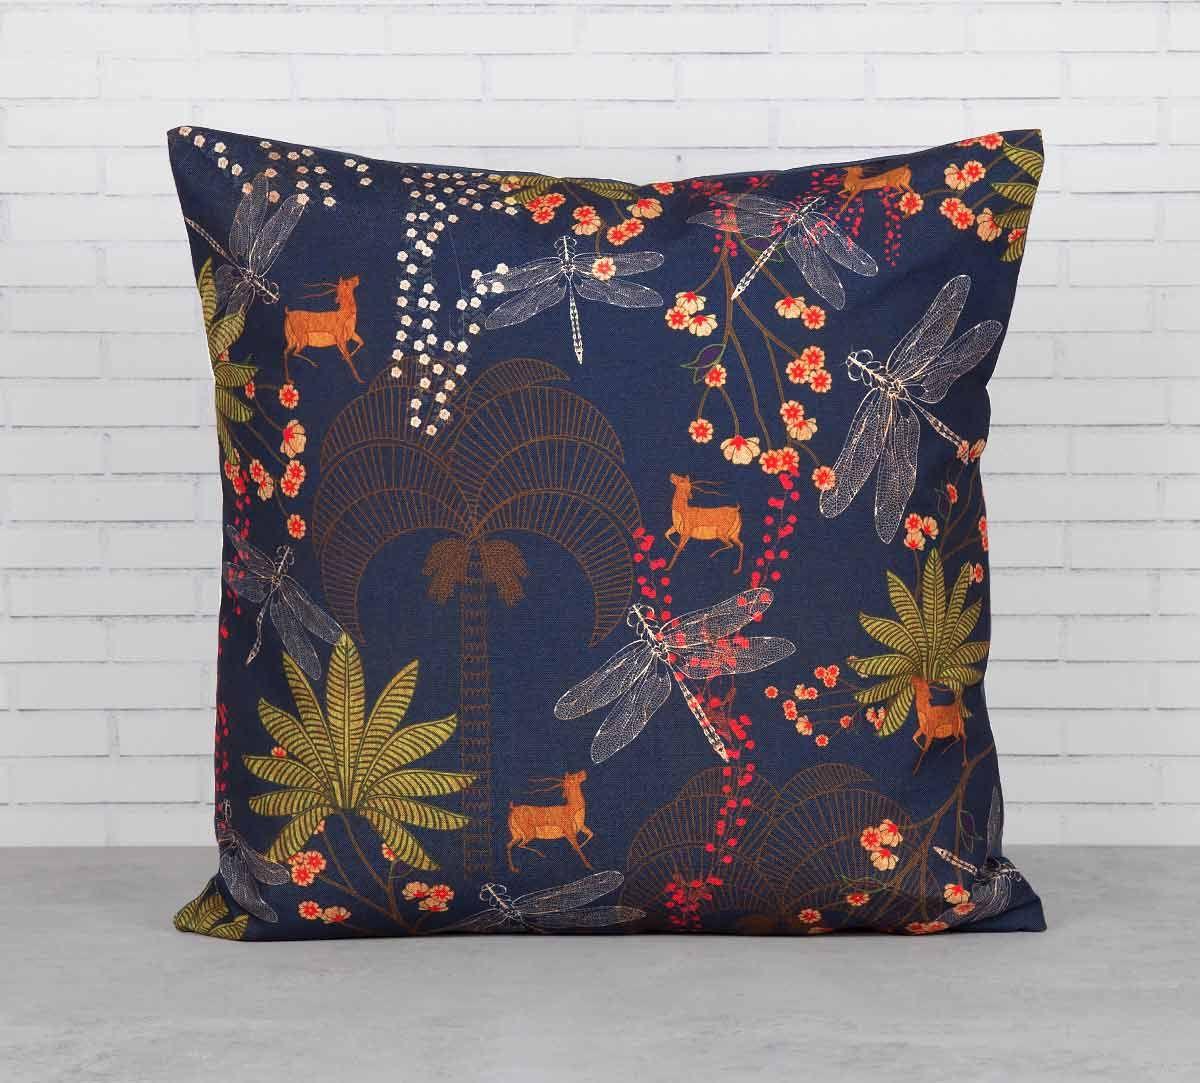 India Circus Palmeria Bloomer Cushion Cover